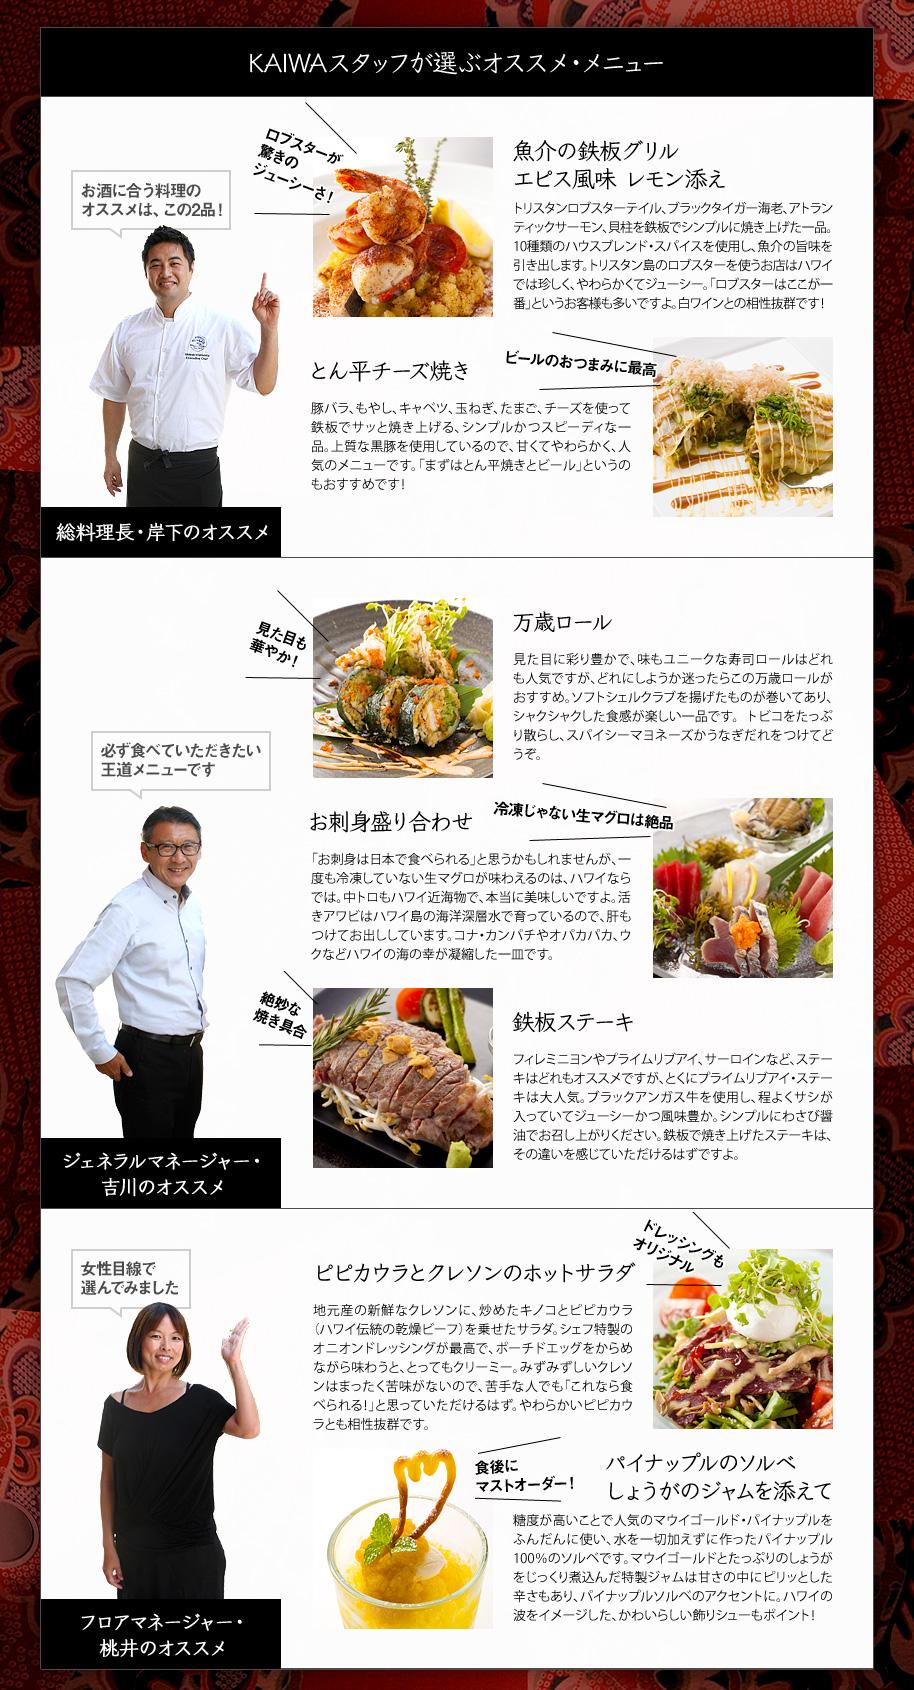 KAIWAスタッフが選ぶオススメ・メニュー